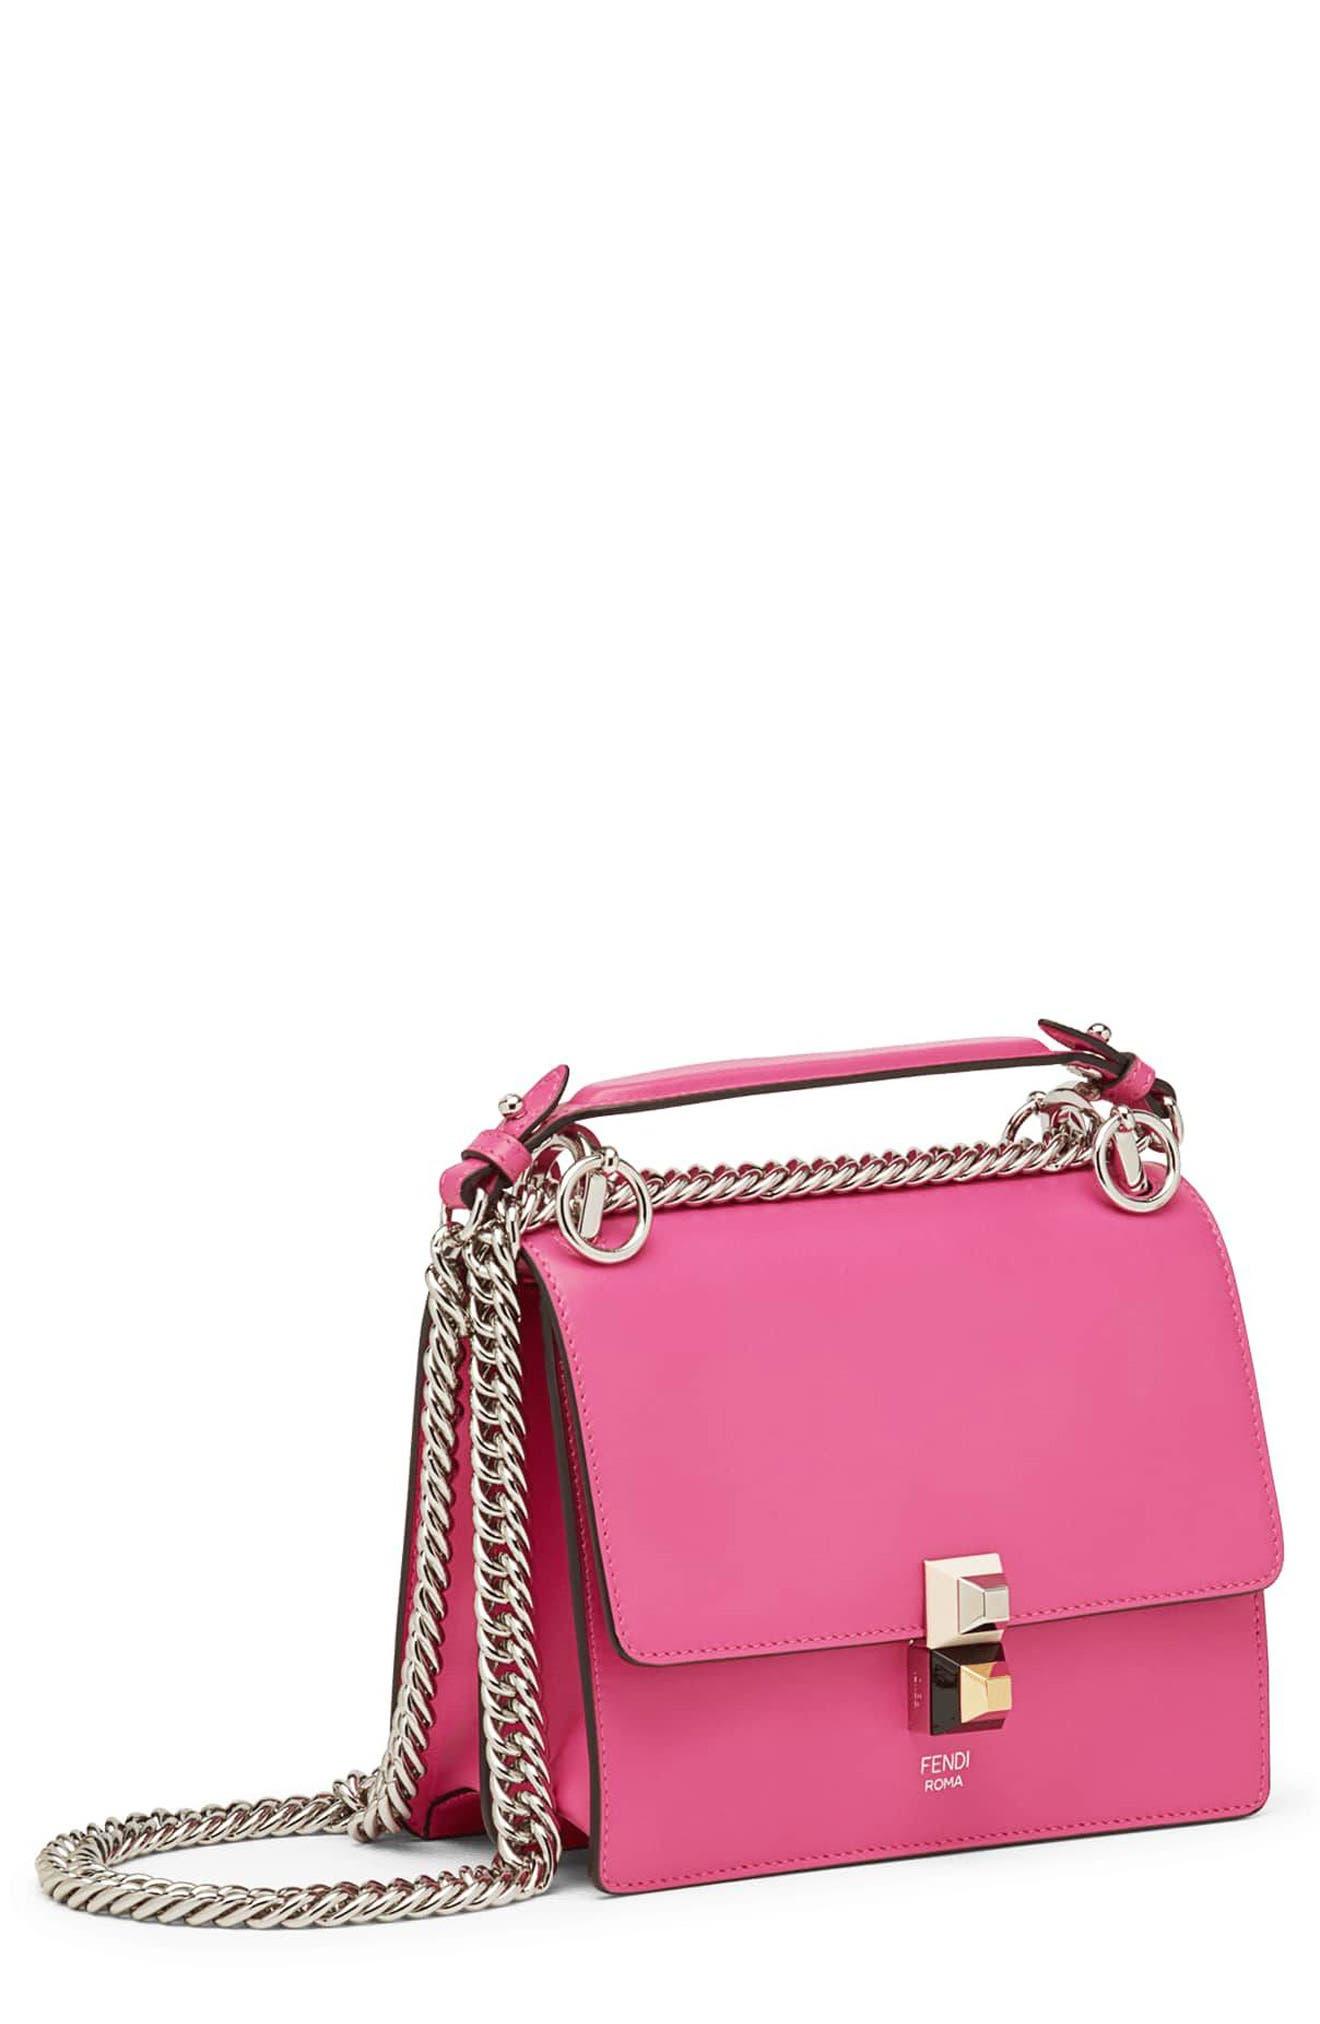 Small Kan I Leather Shoulder Bag,                         Main,                         color, GERANIUM